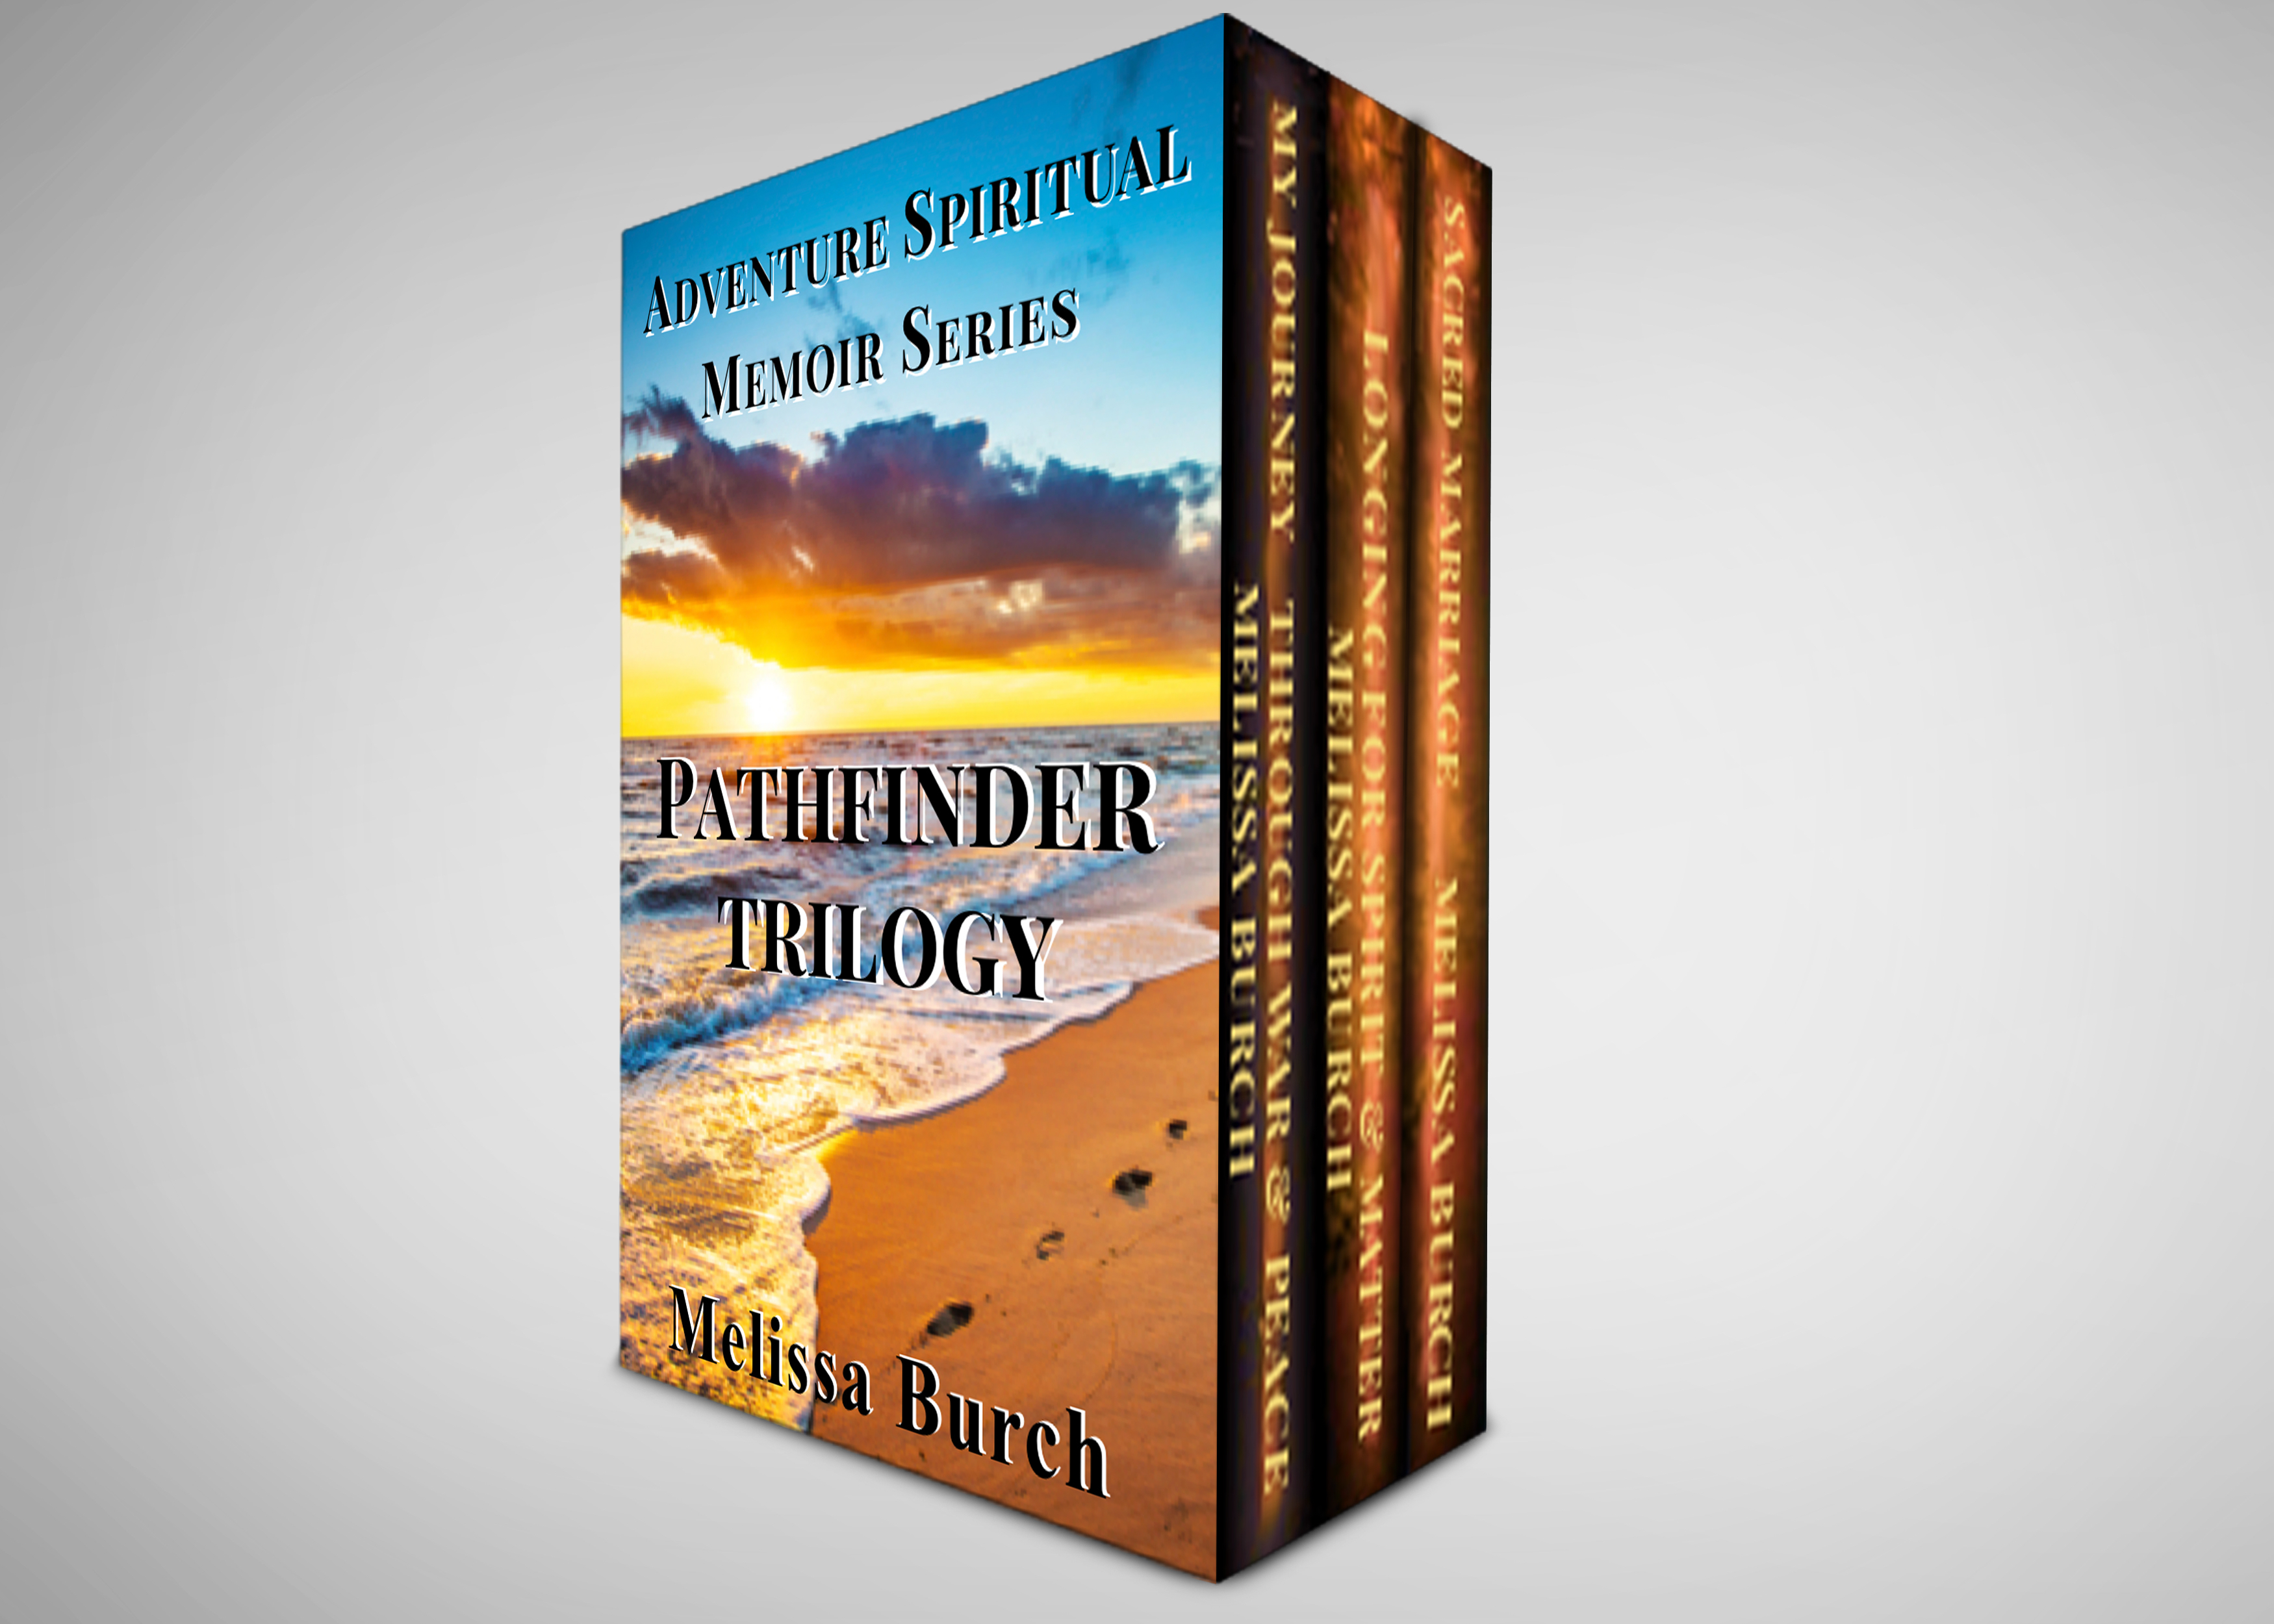 Pathfinder Trilogy: Adventurous Spiritual Memoir Series